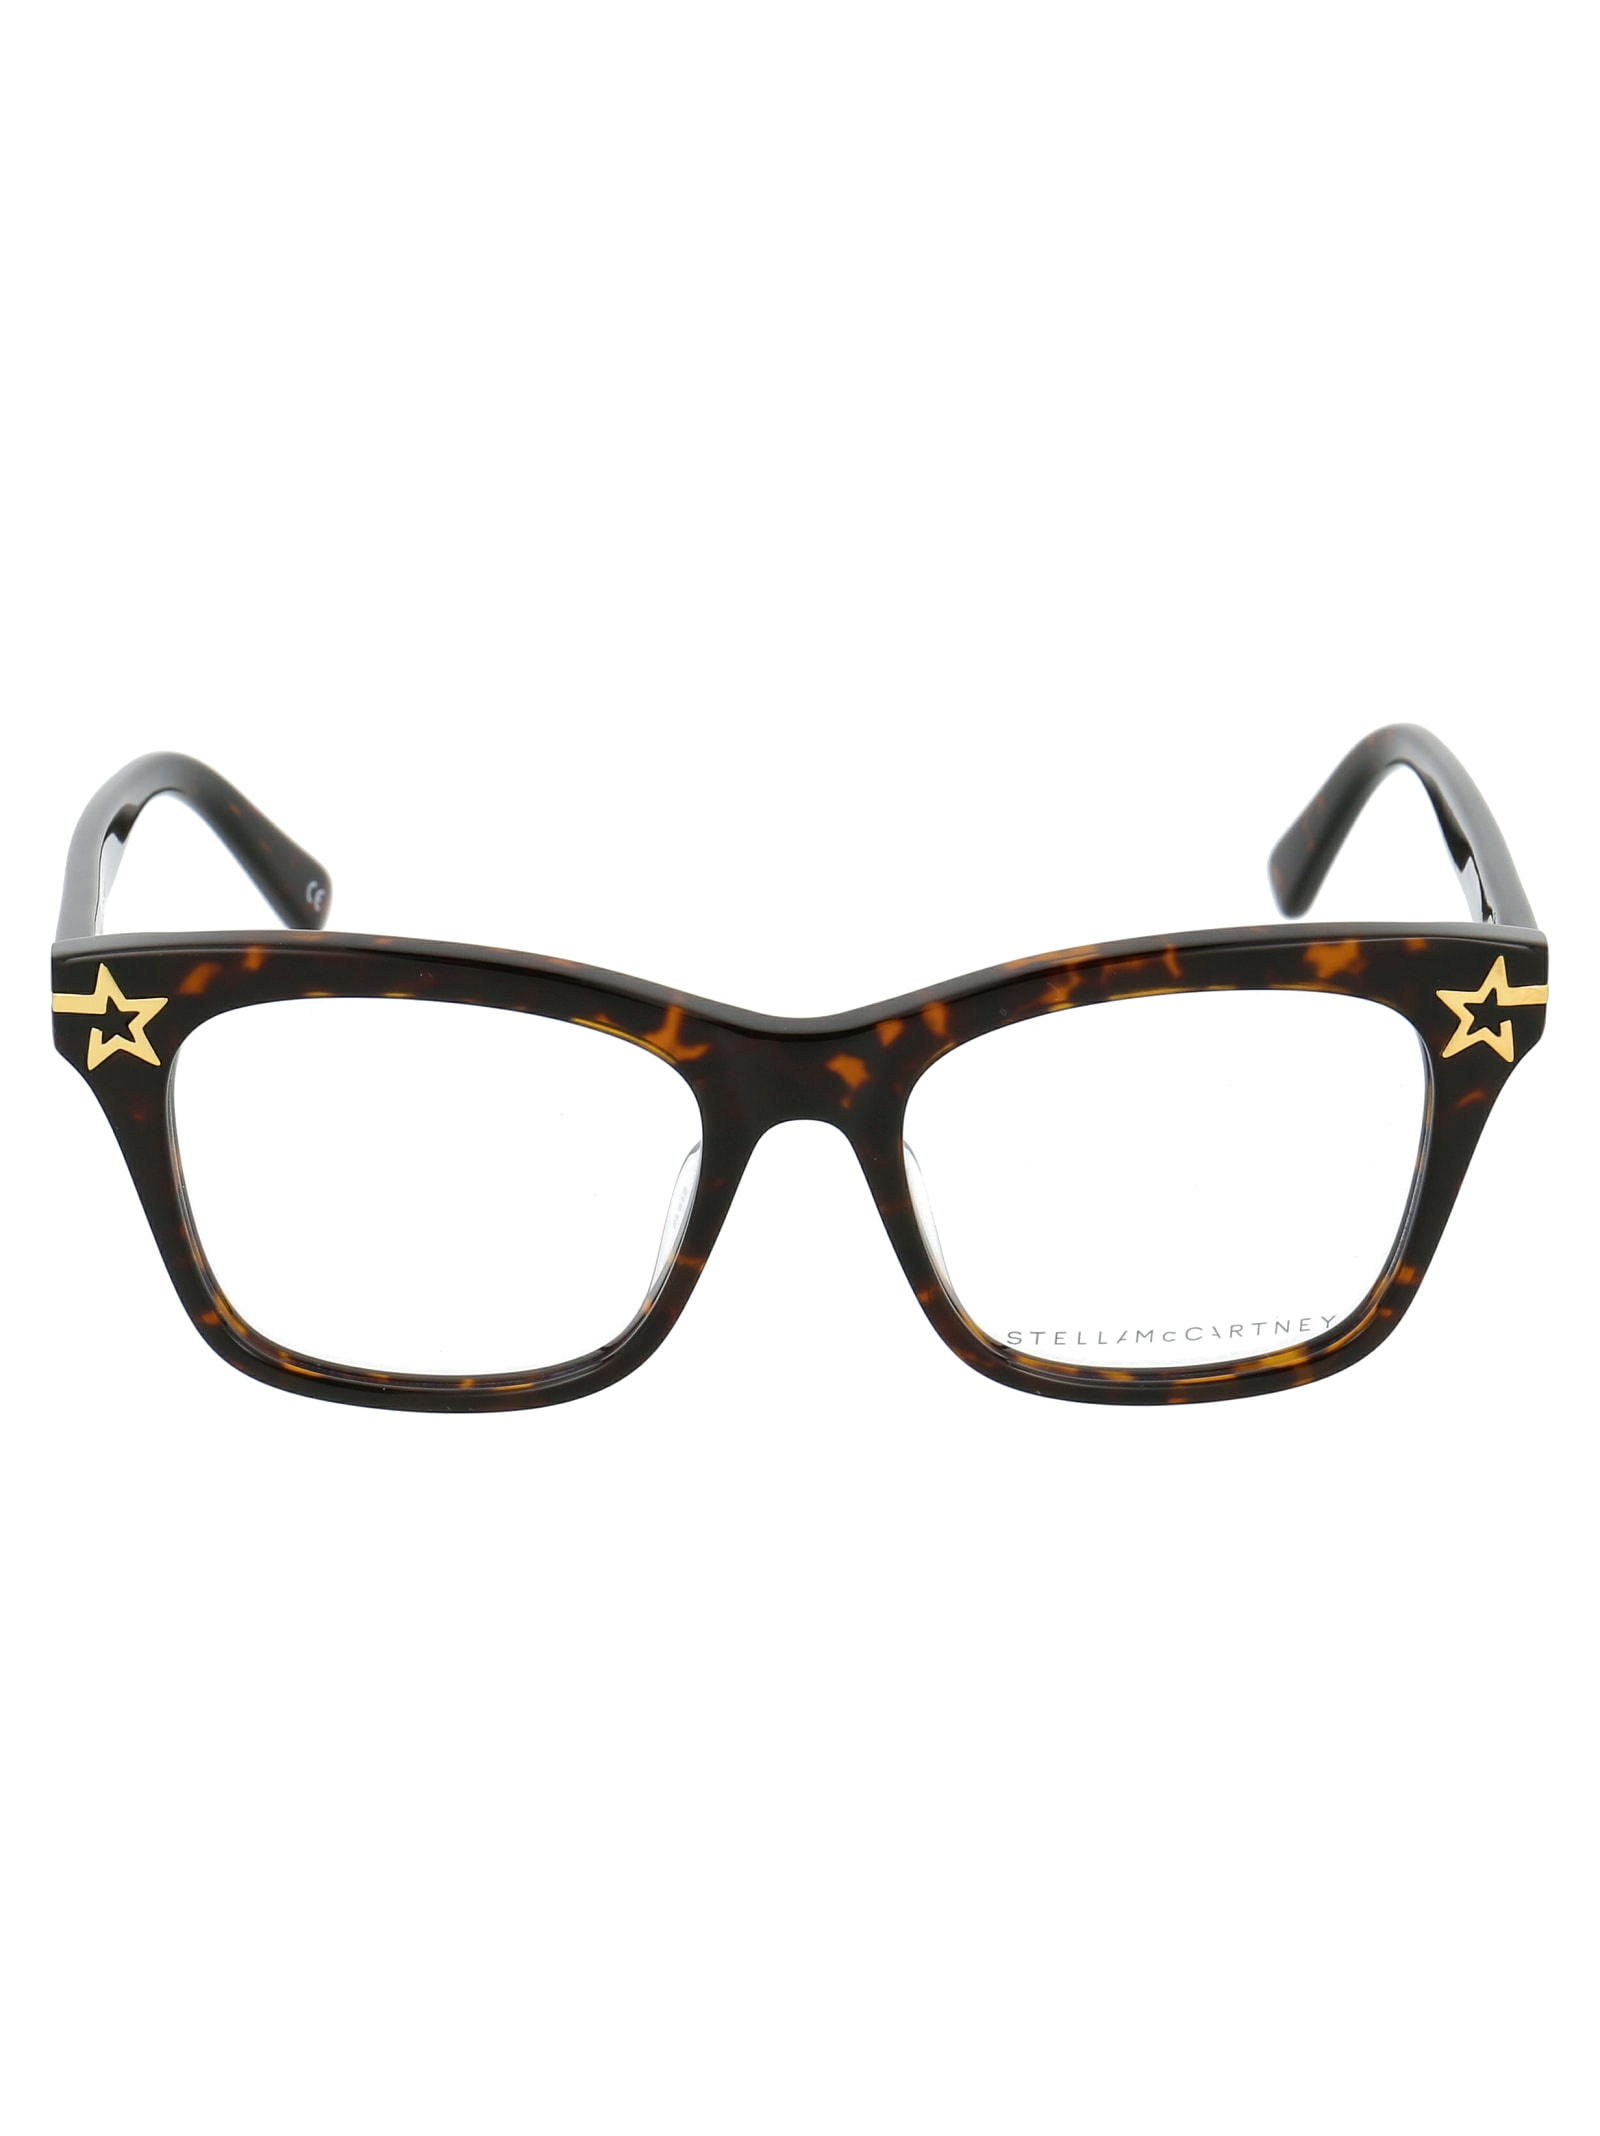 Stella McCartney Glasses